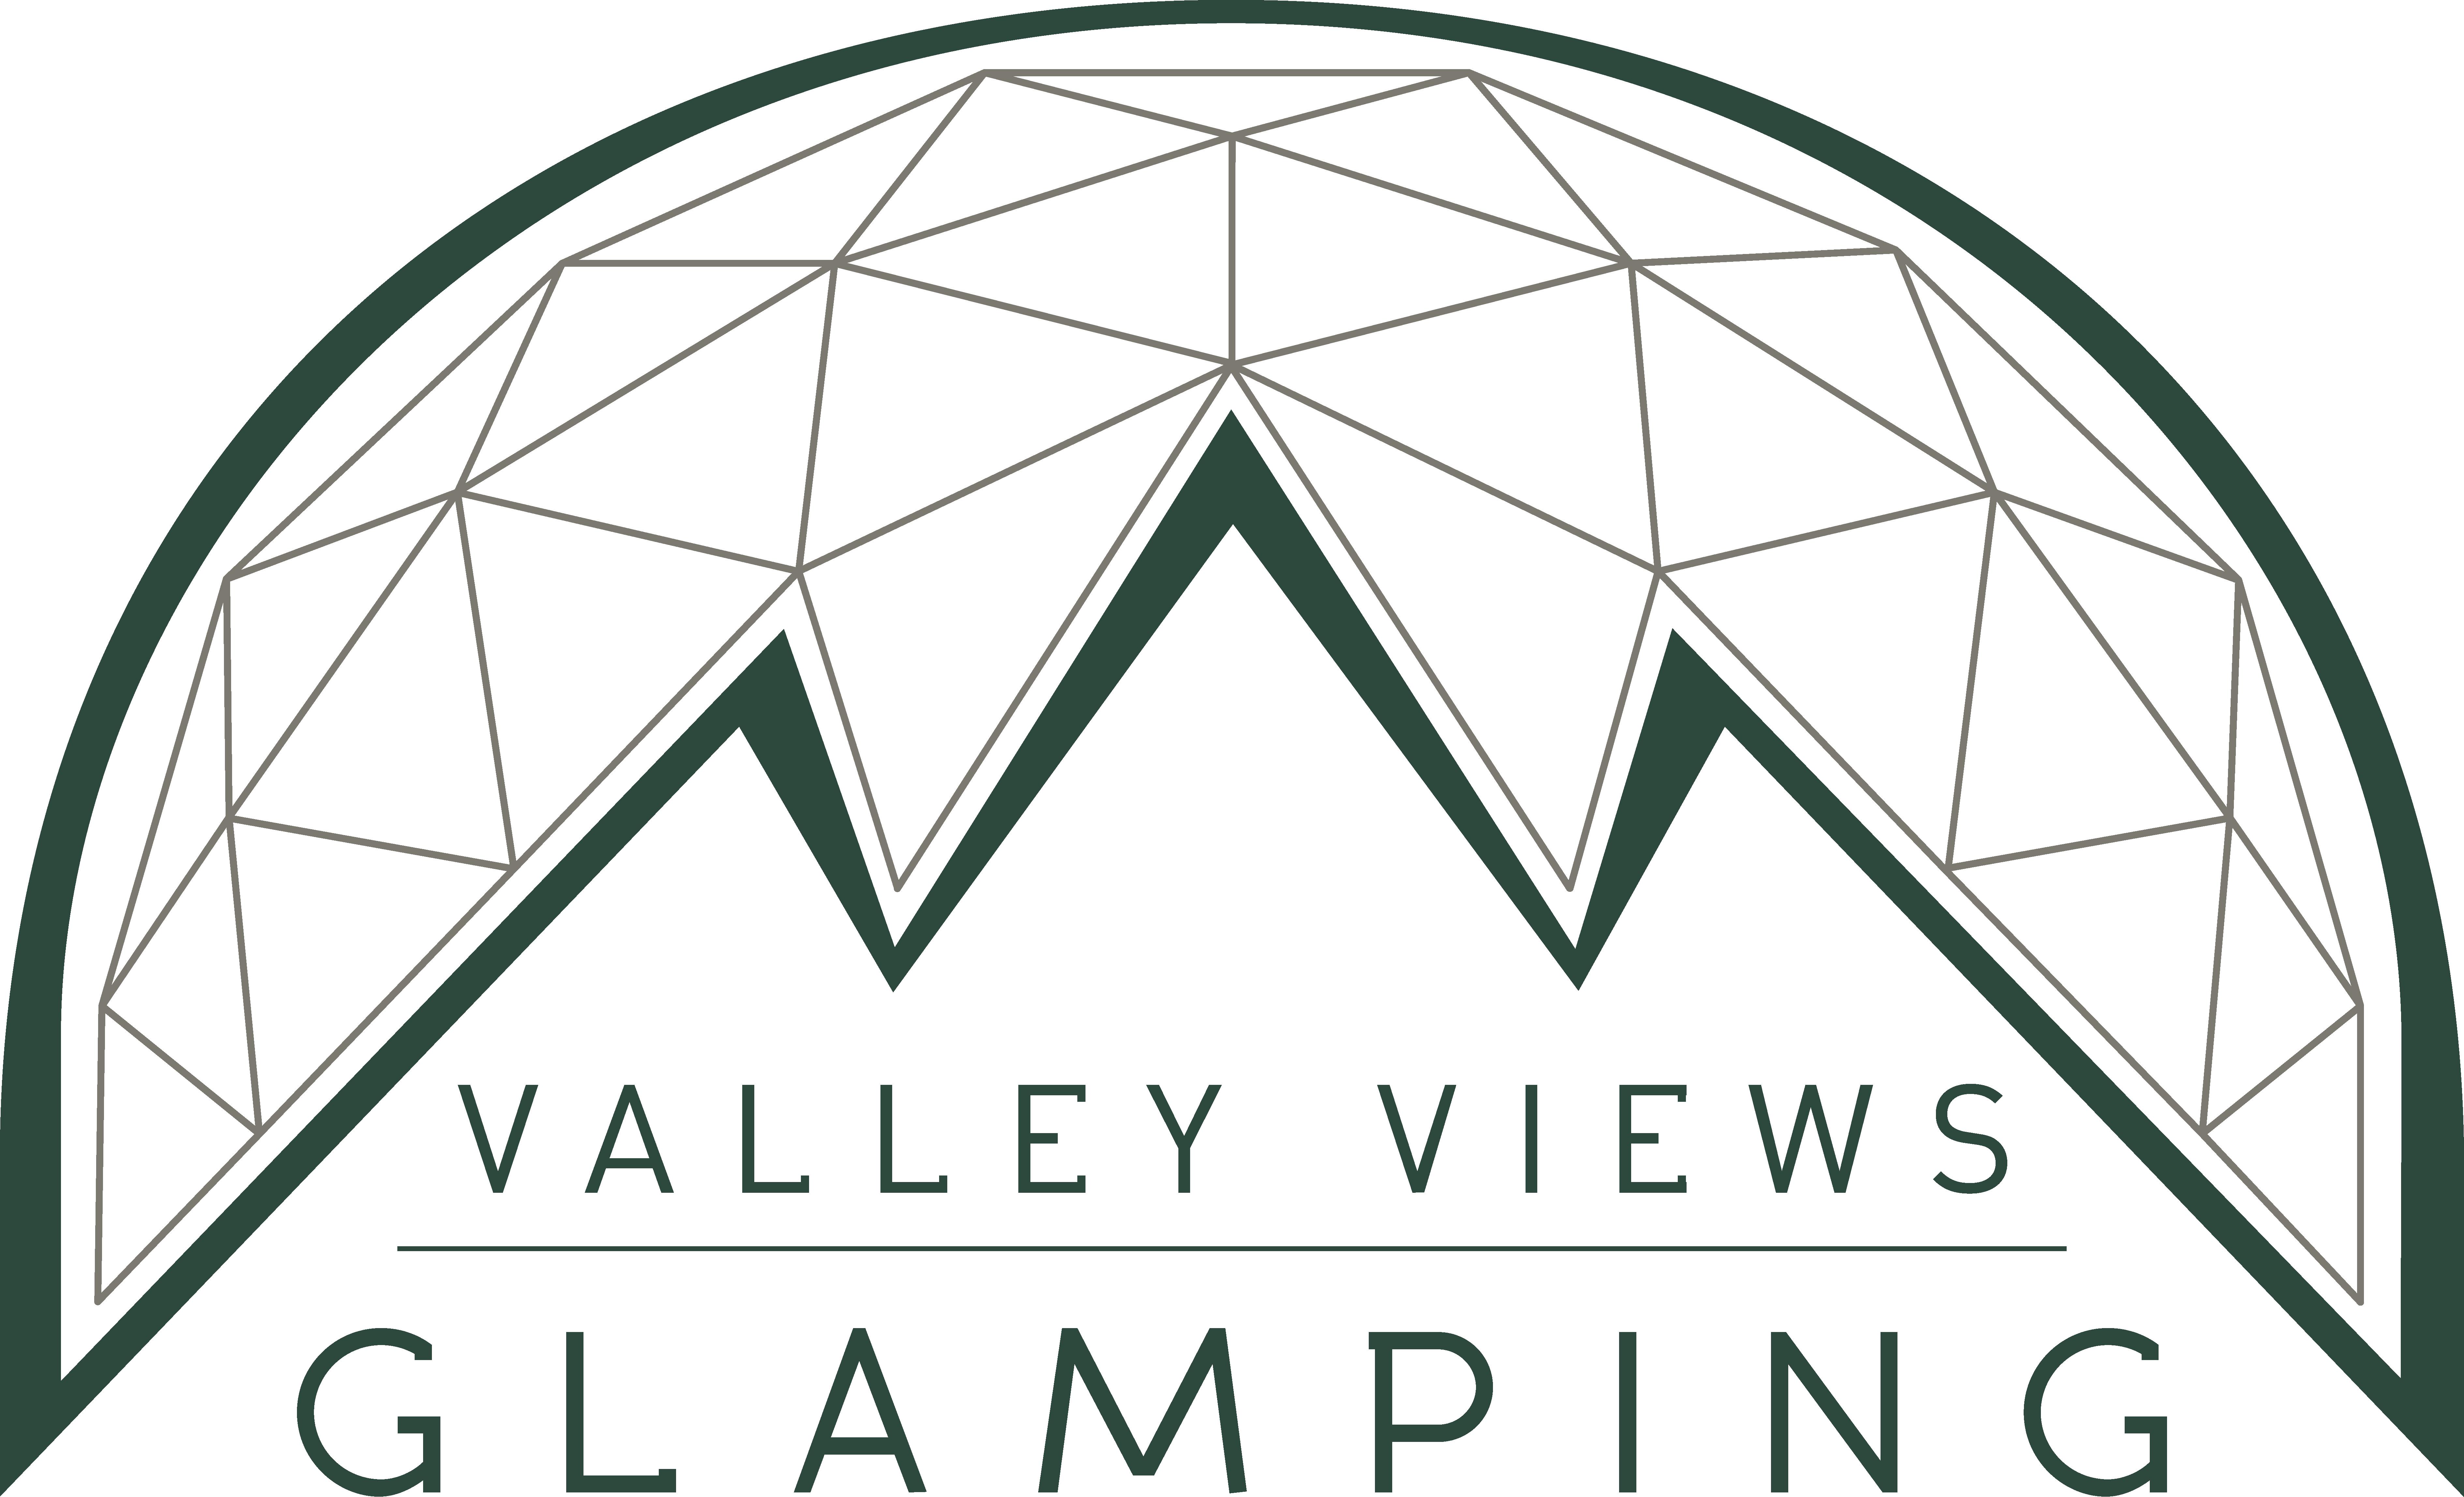 valley views glamping logo